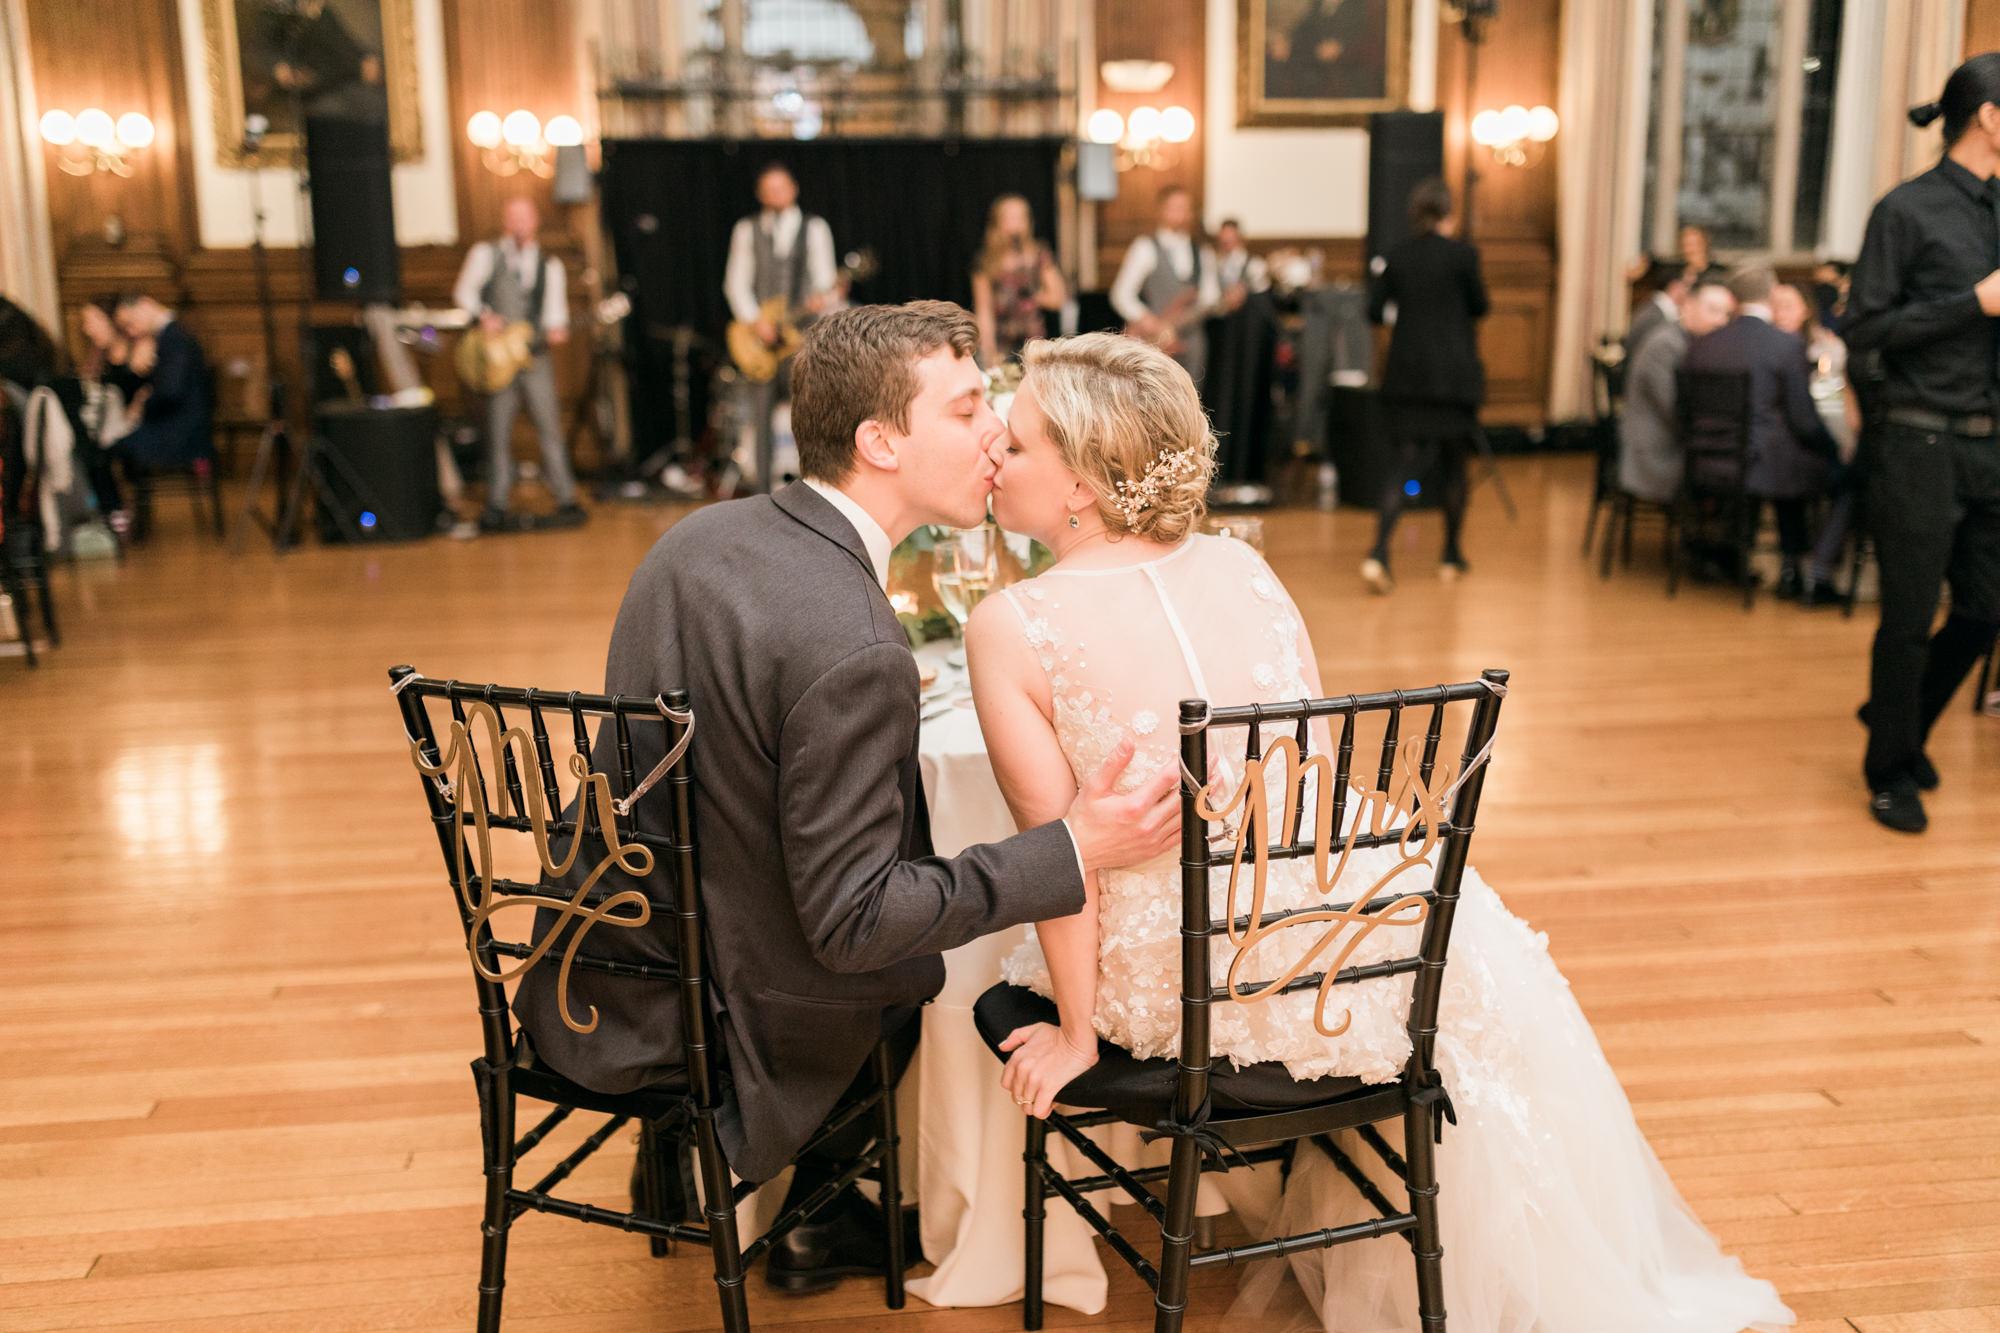 haley-richter-photography-autumn-college-of-physicians-wedding-philadelphia--336.jpg